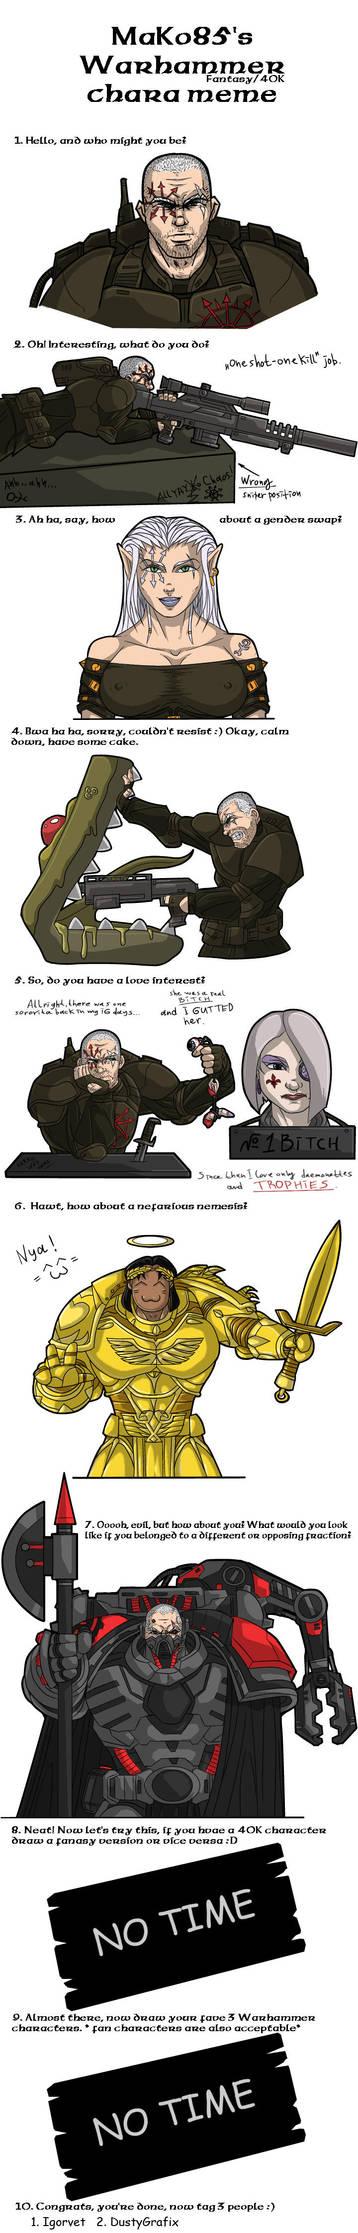 Warhammer 40k Meme By Kain Moerder On Deviantart